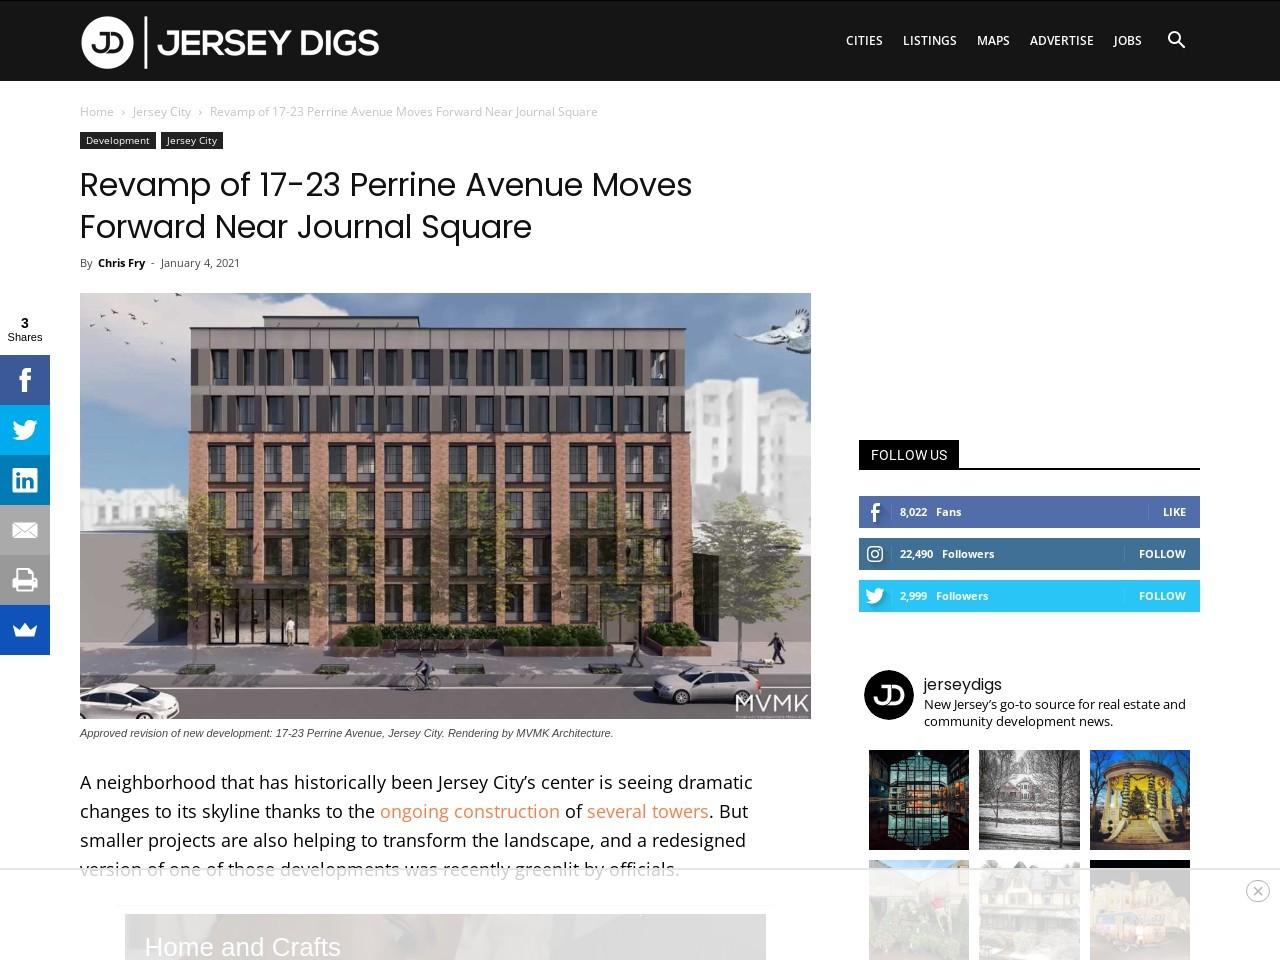 Revamp of 17-23 Perrine Avenue Moves Forward Near Journal Square